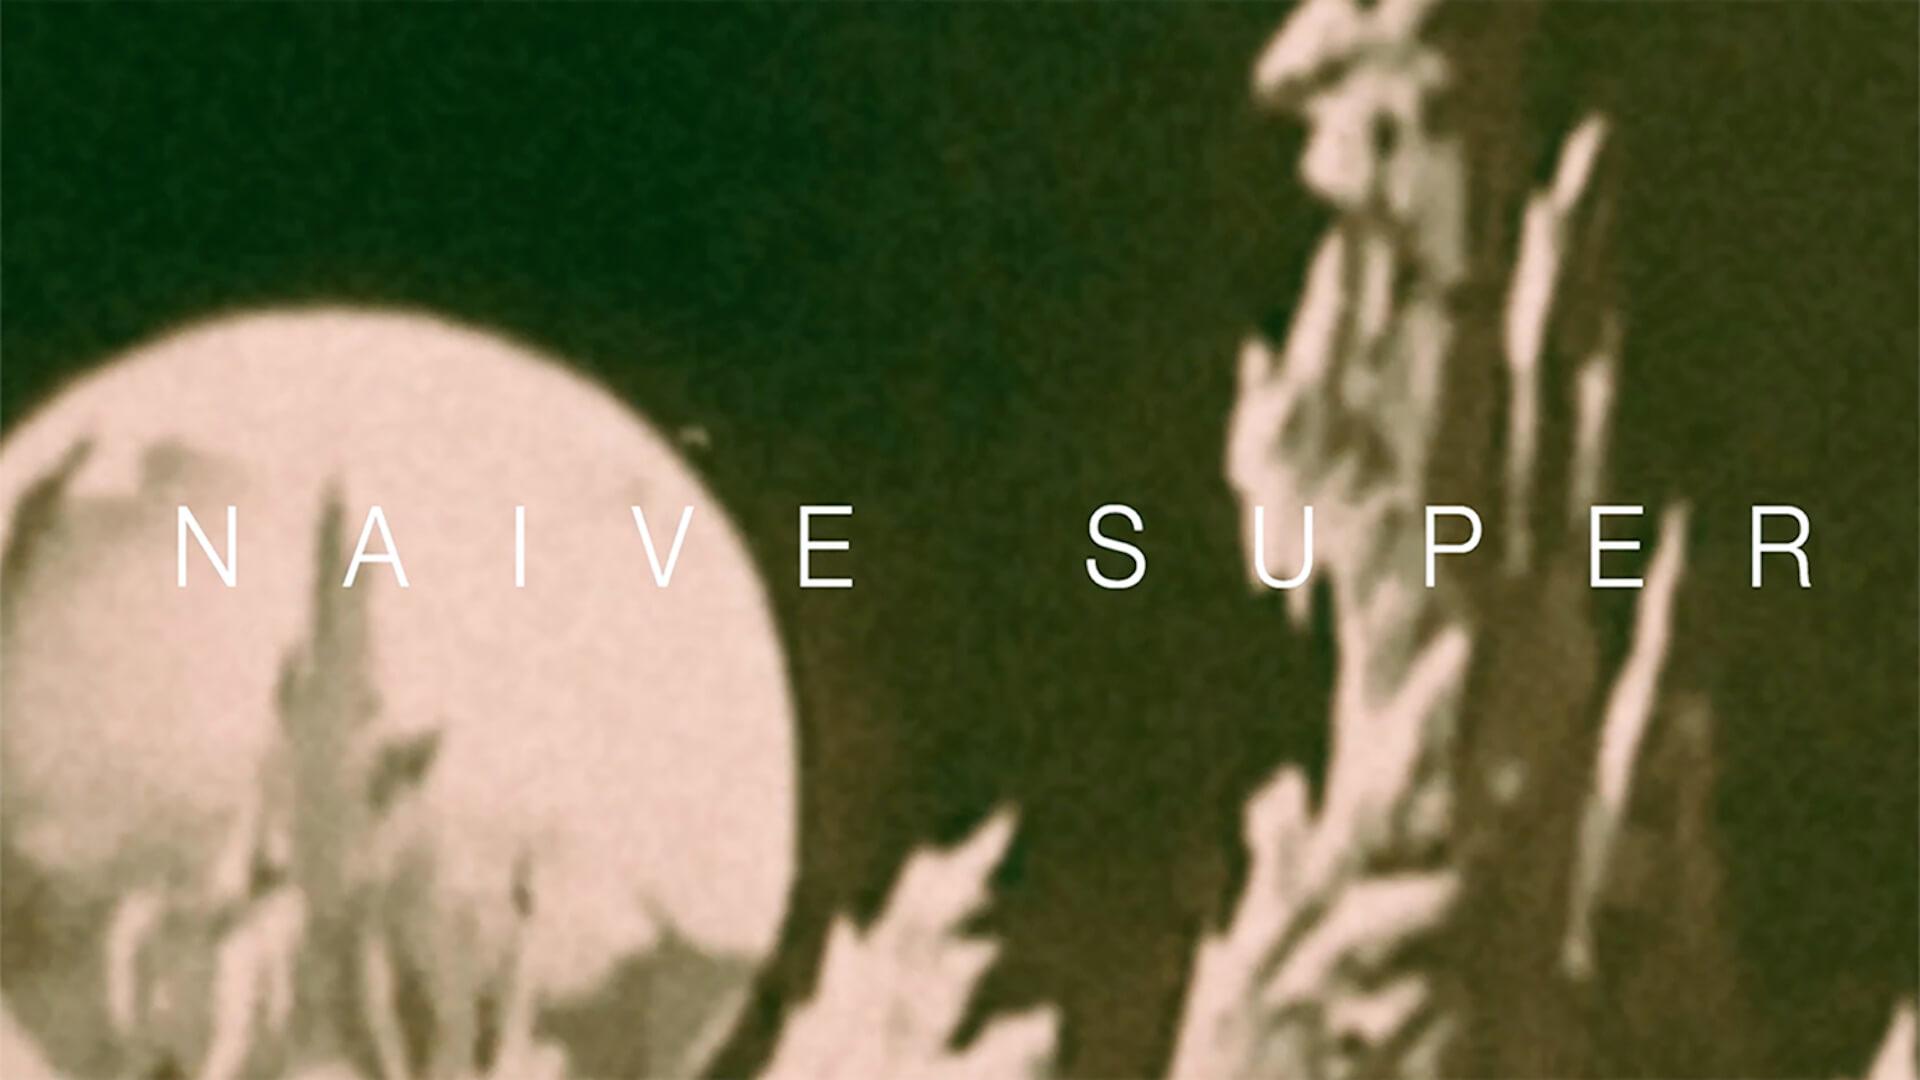 "Naive Superが野宮真貴を迎えた""Memories Of Moonage Nightlife""をリリース!「月」をテーマに連続リリースも決定 music200624_naivesuper_04"